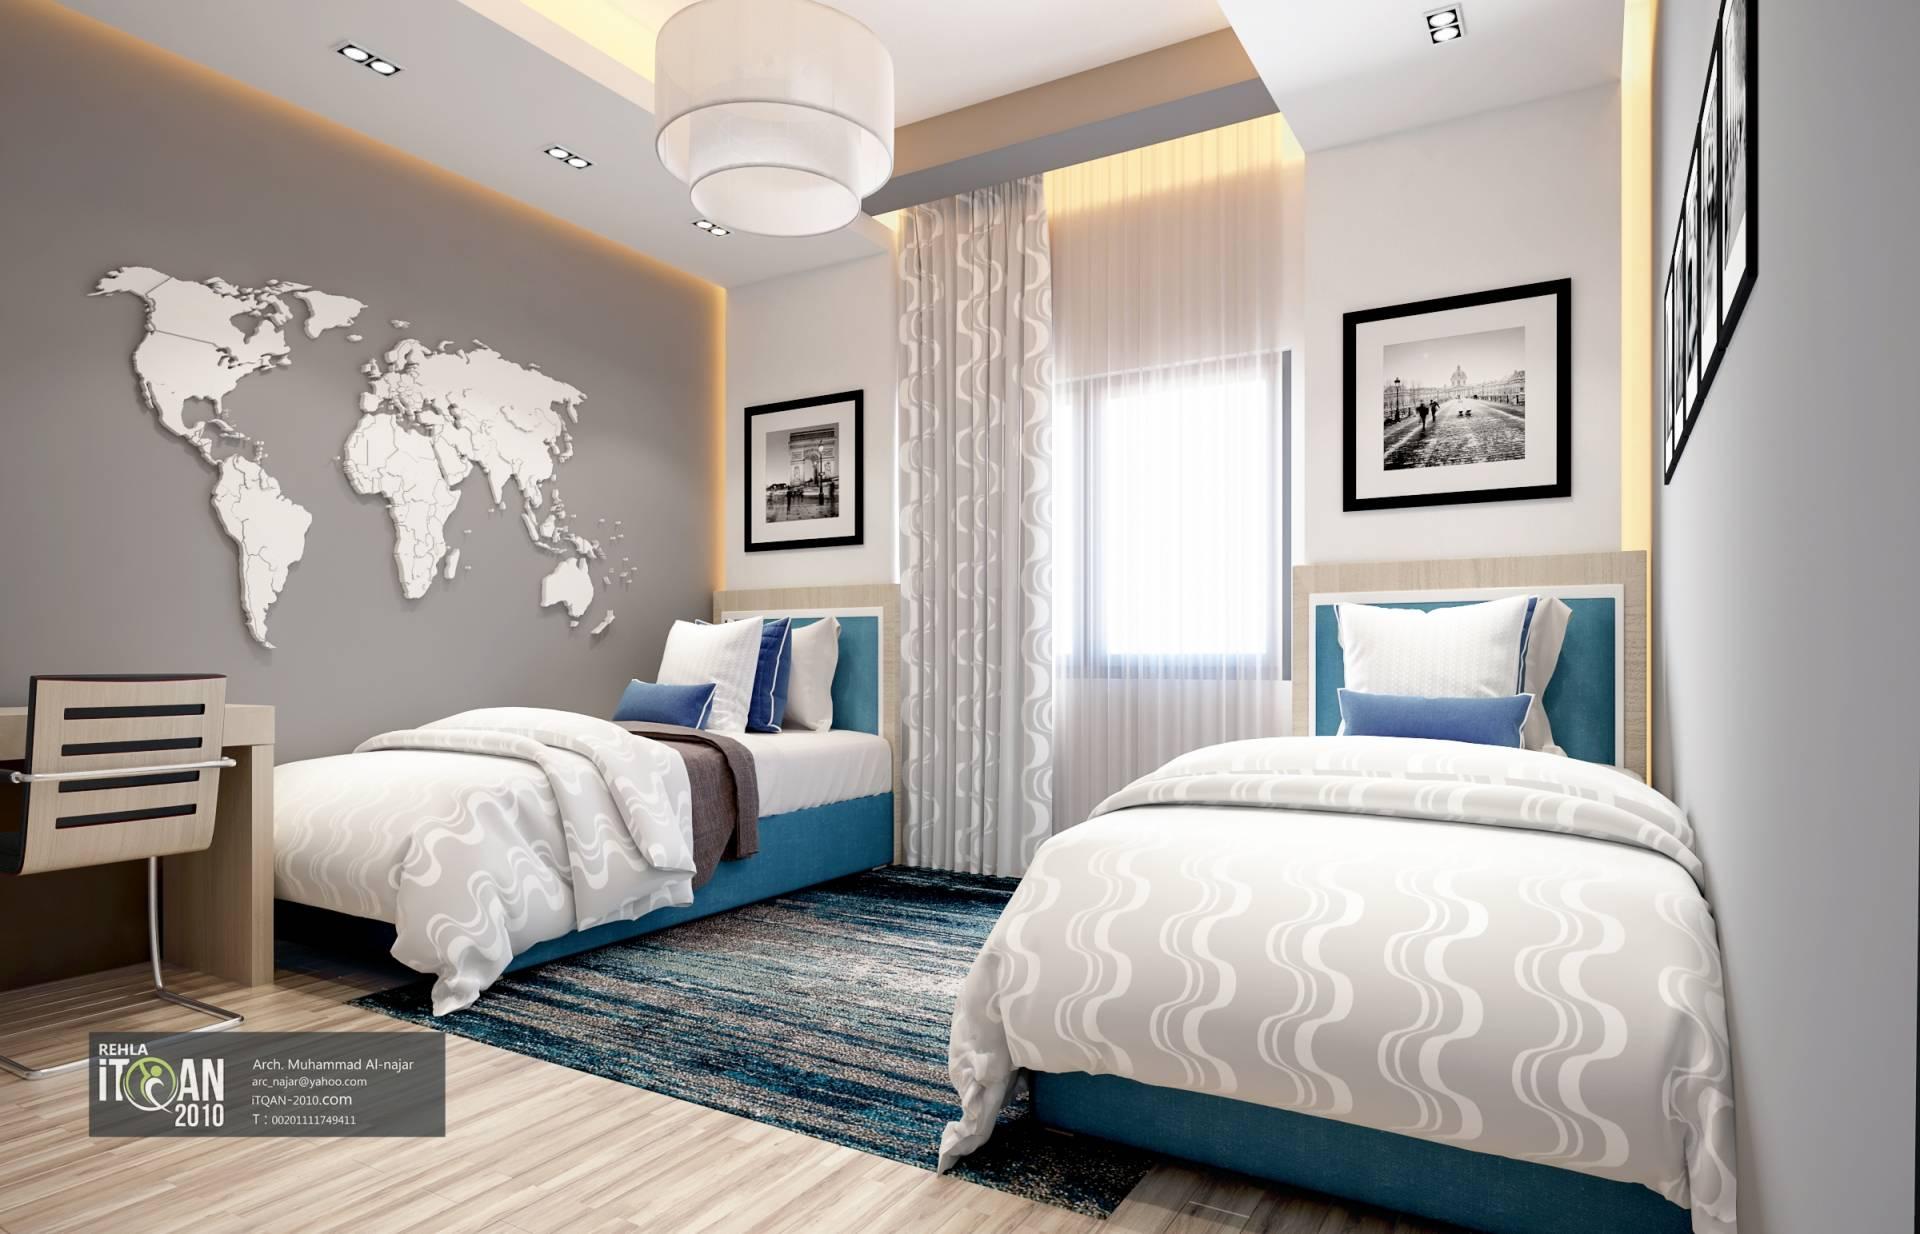 167 renovation existing flat colors walls ceiling modified3 admin